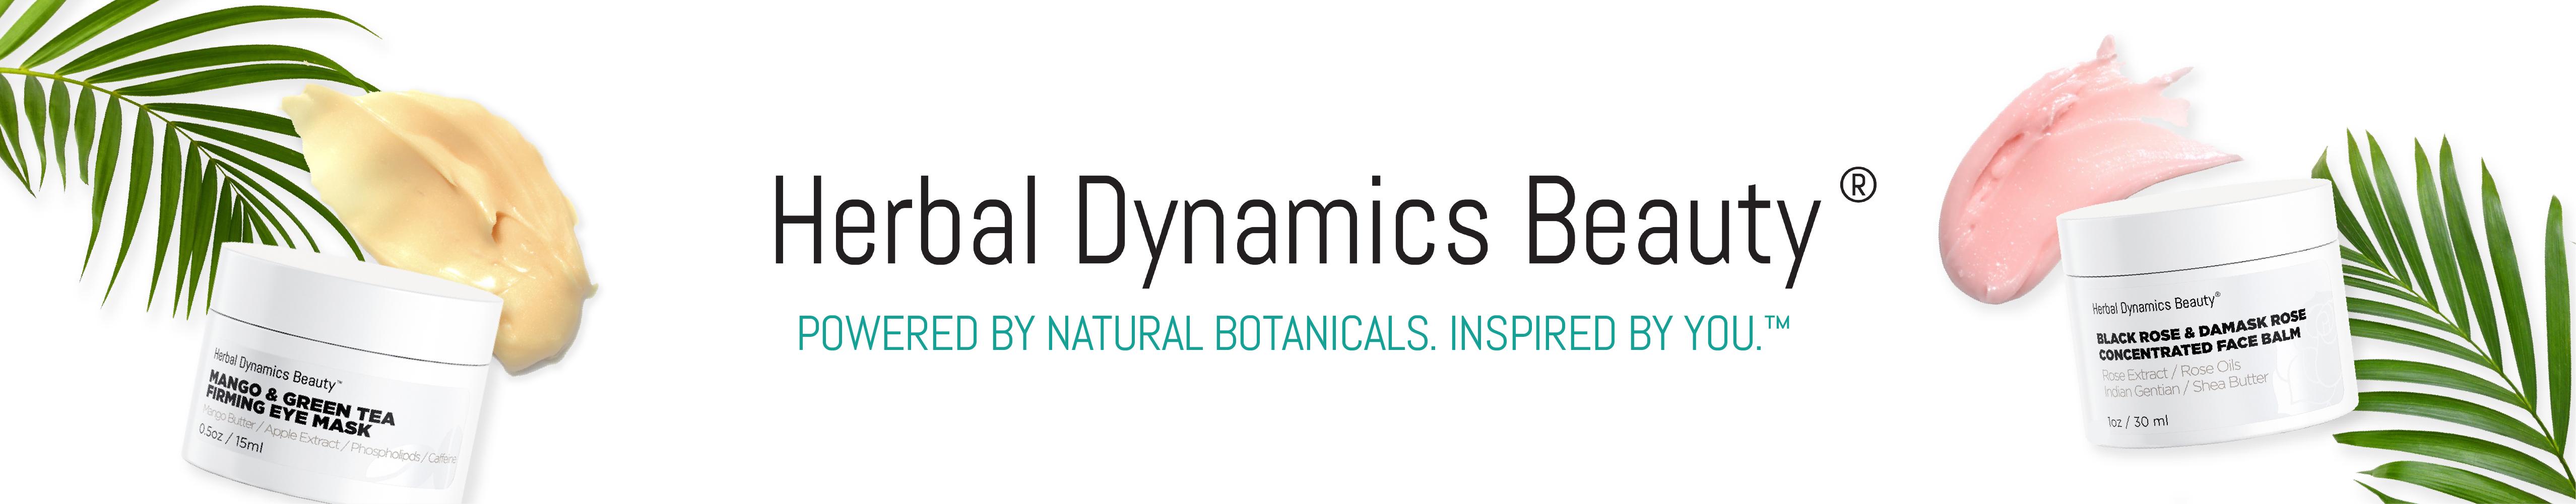 herbal-dynamics-beauty.jpg